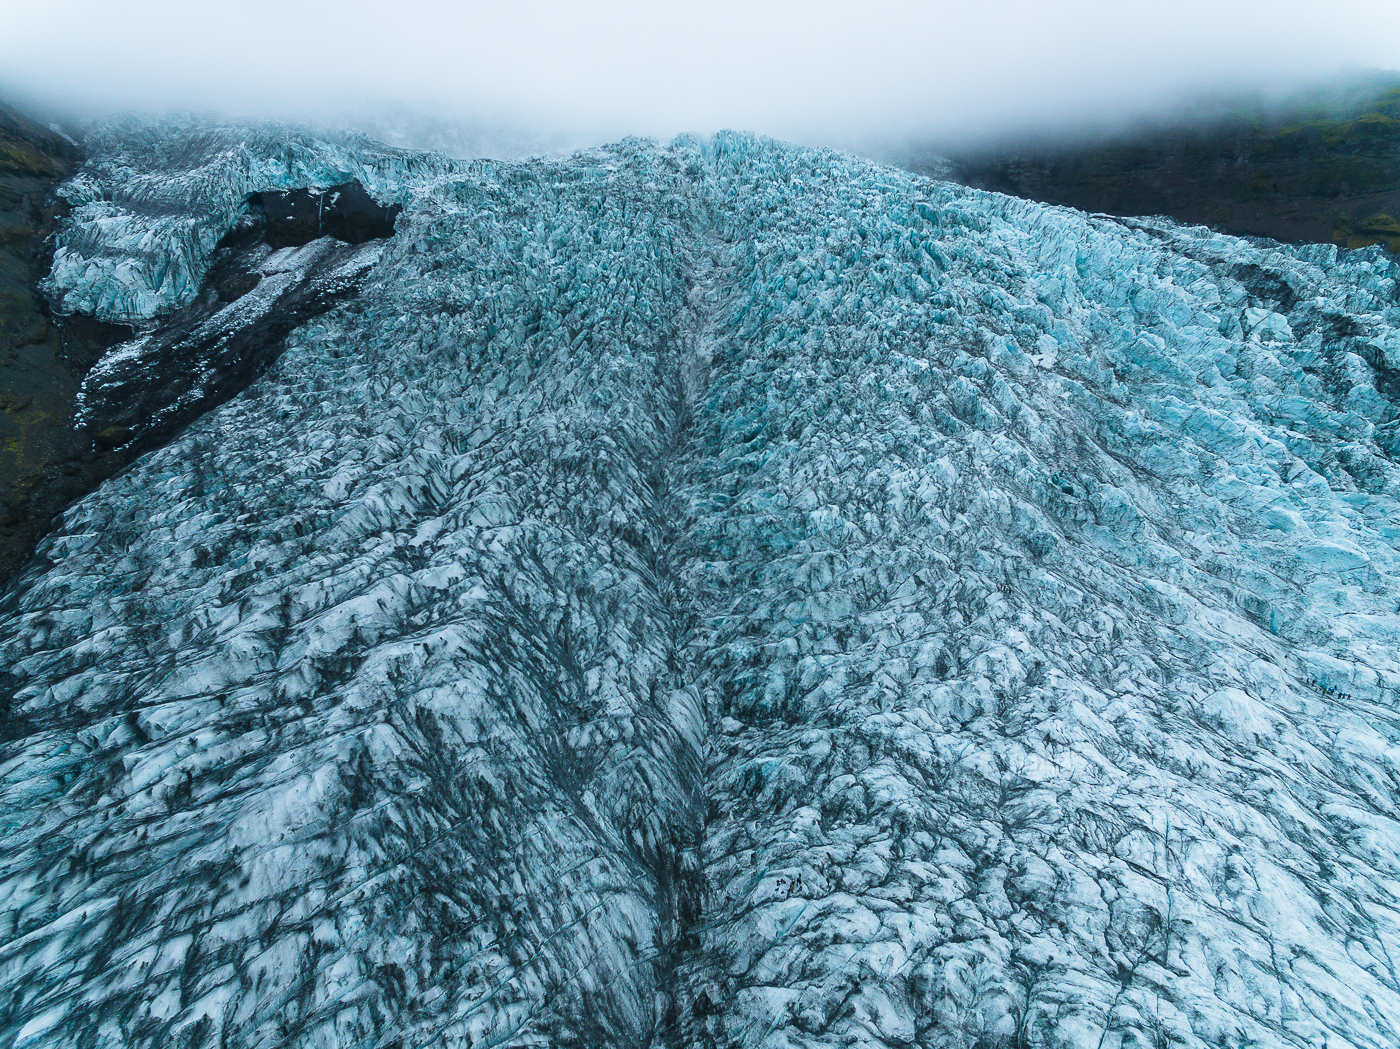 gabornagy_photography_iceland_glacier2.jpg